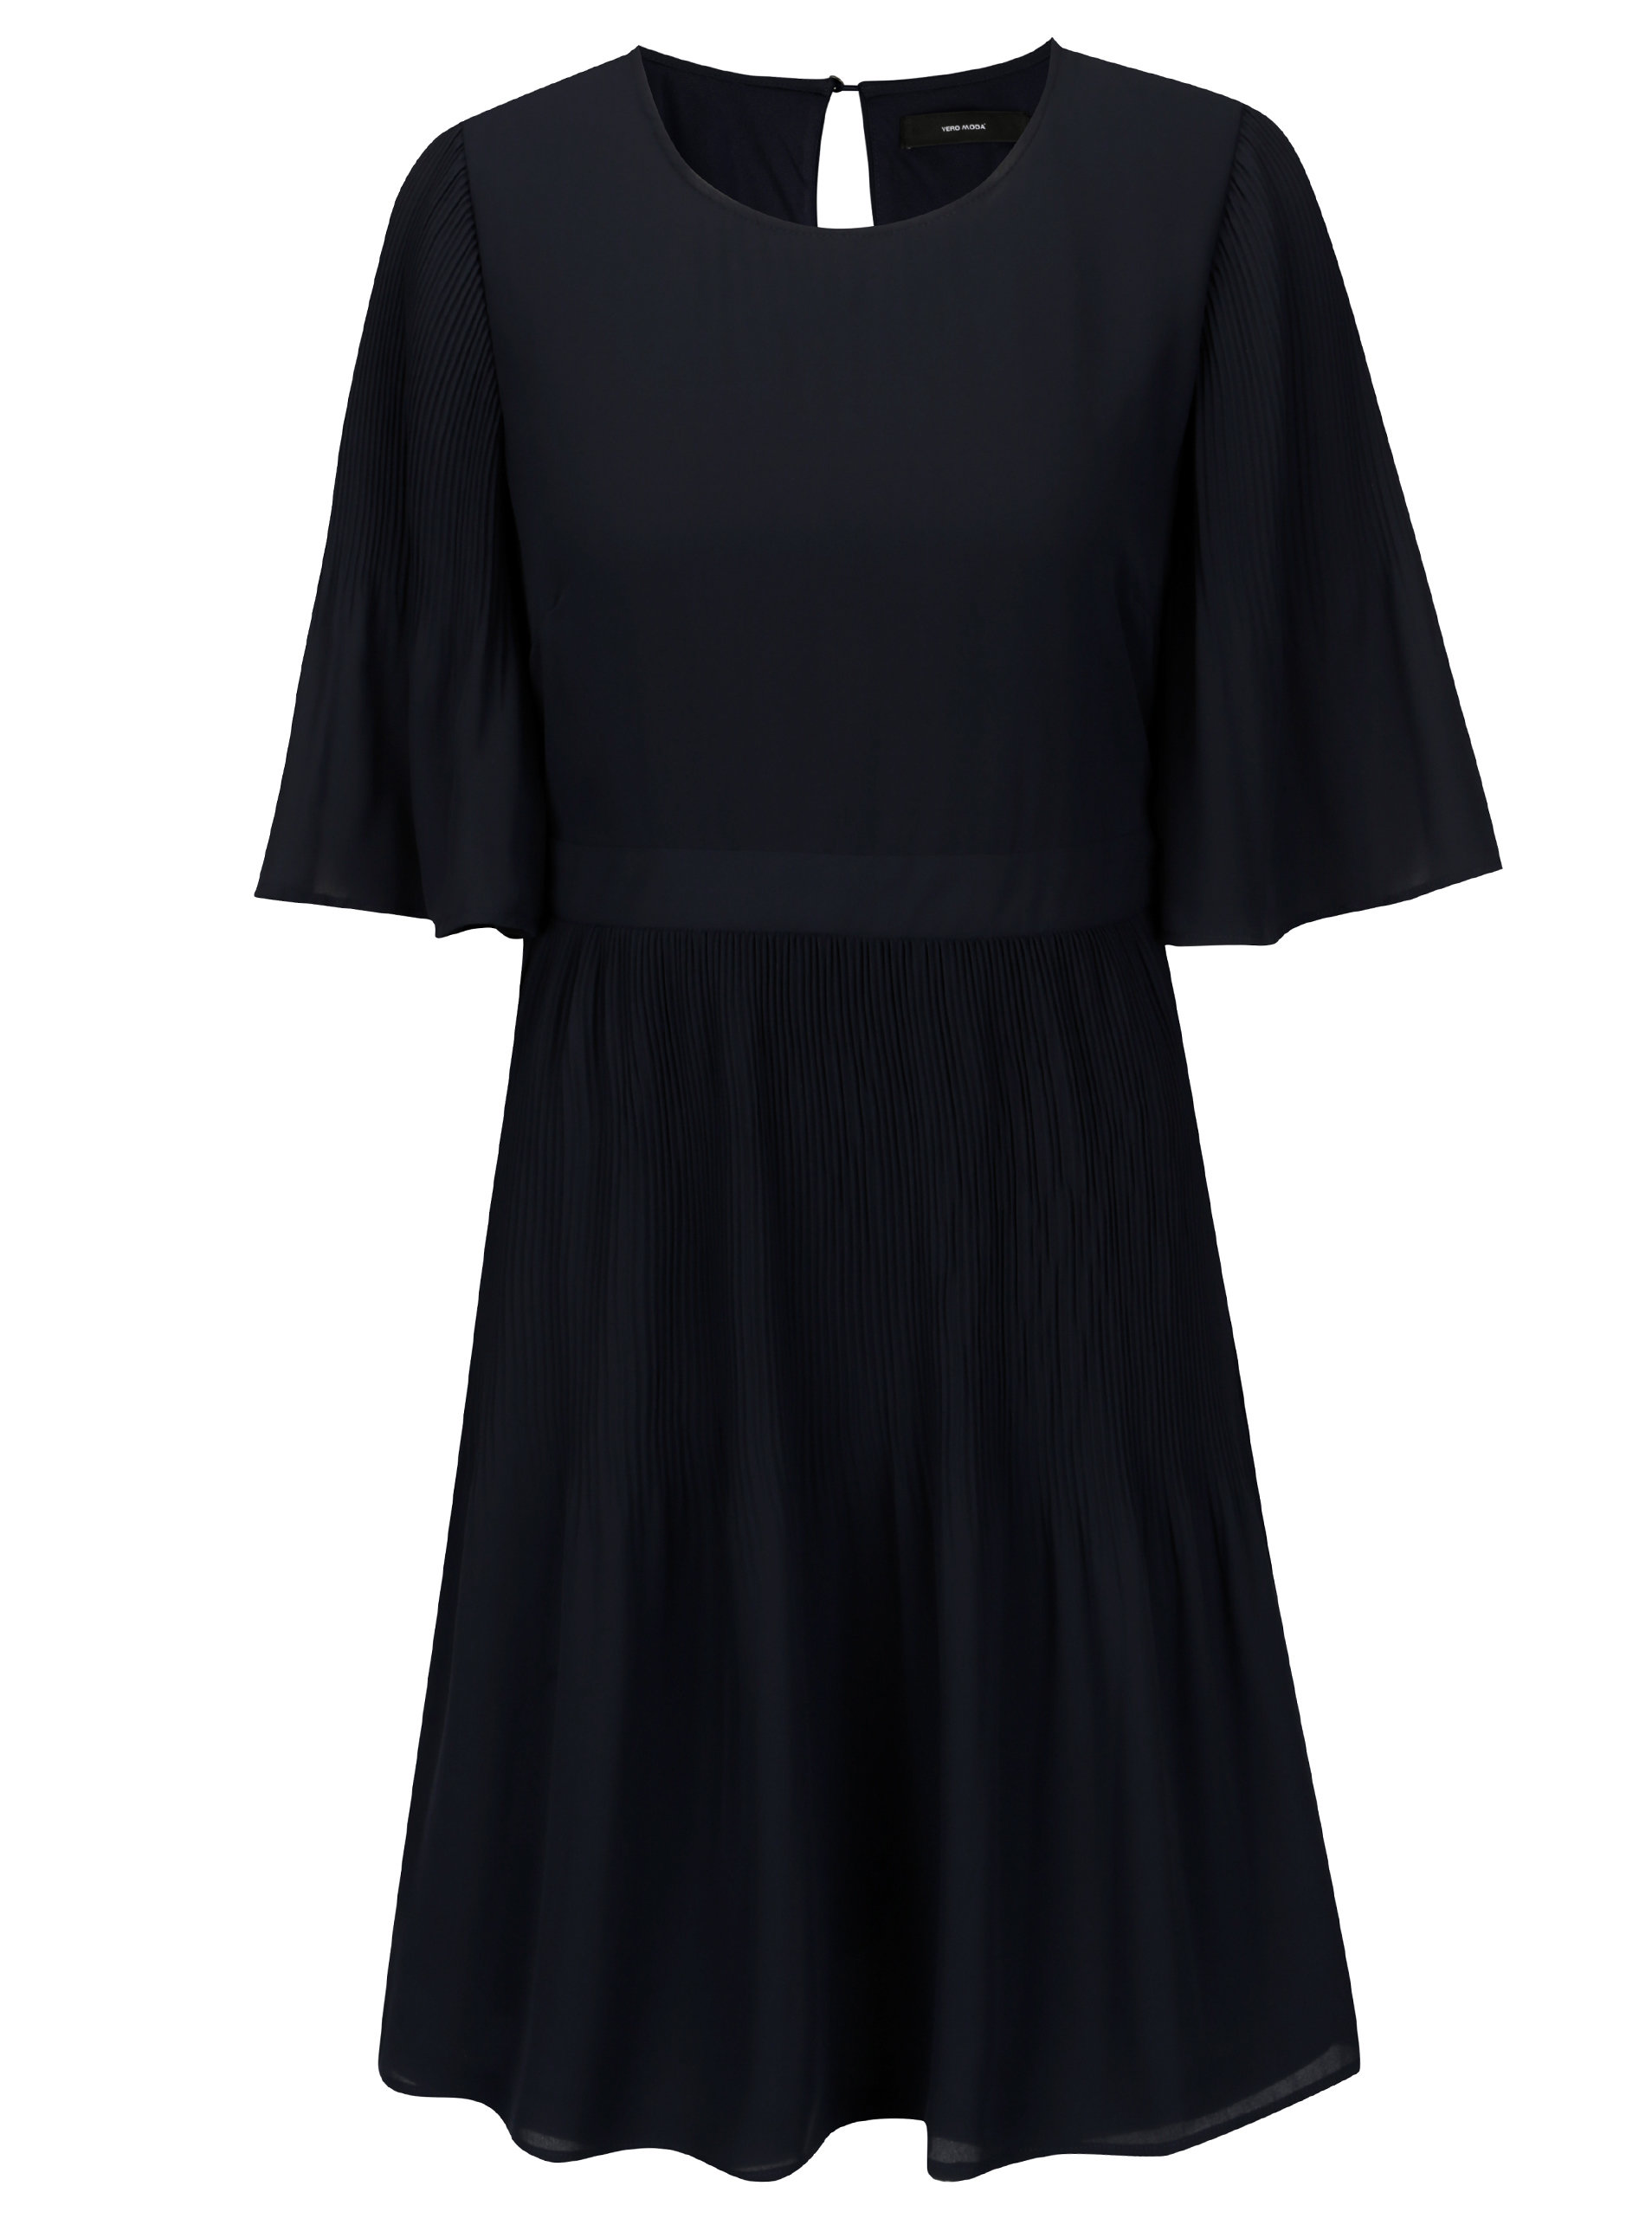 e25ed0fa0d Tmavomodré šaty s 3 4 rukávom VERO MODA Amanda ...